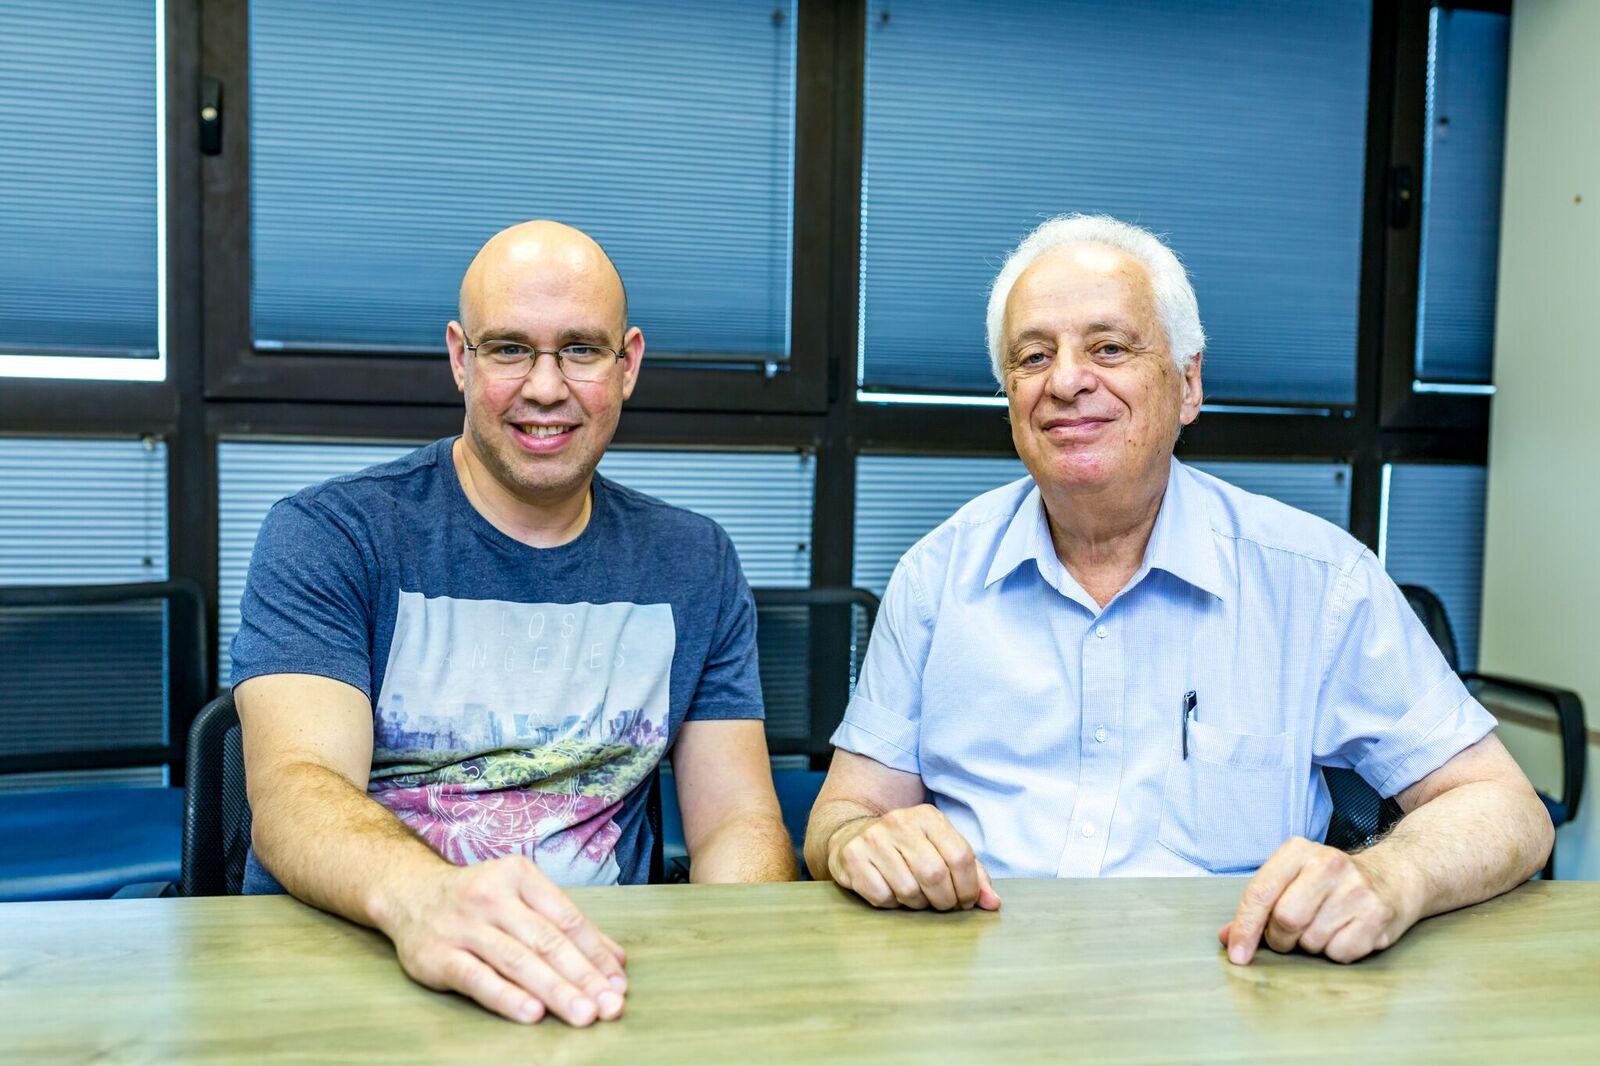 Проф. Исраэль Влодавски и д-р Ури Бараш. Фото: Таль Хефец, пресс-служба Техниона